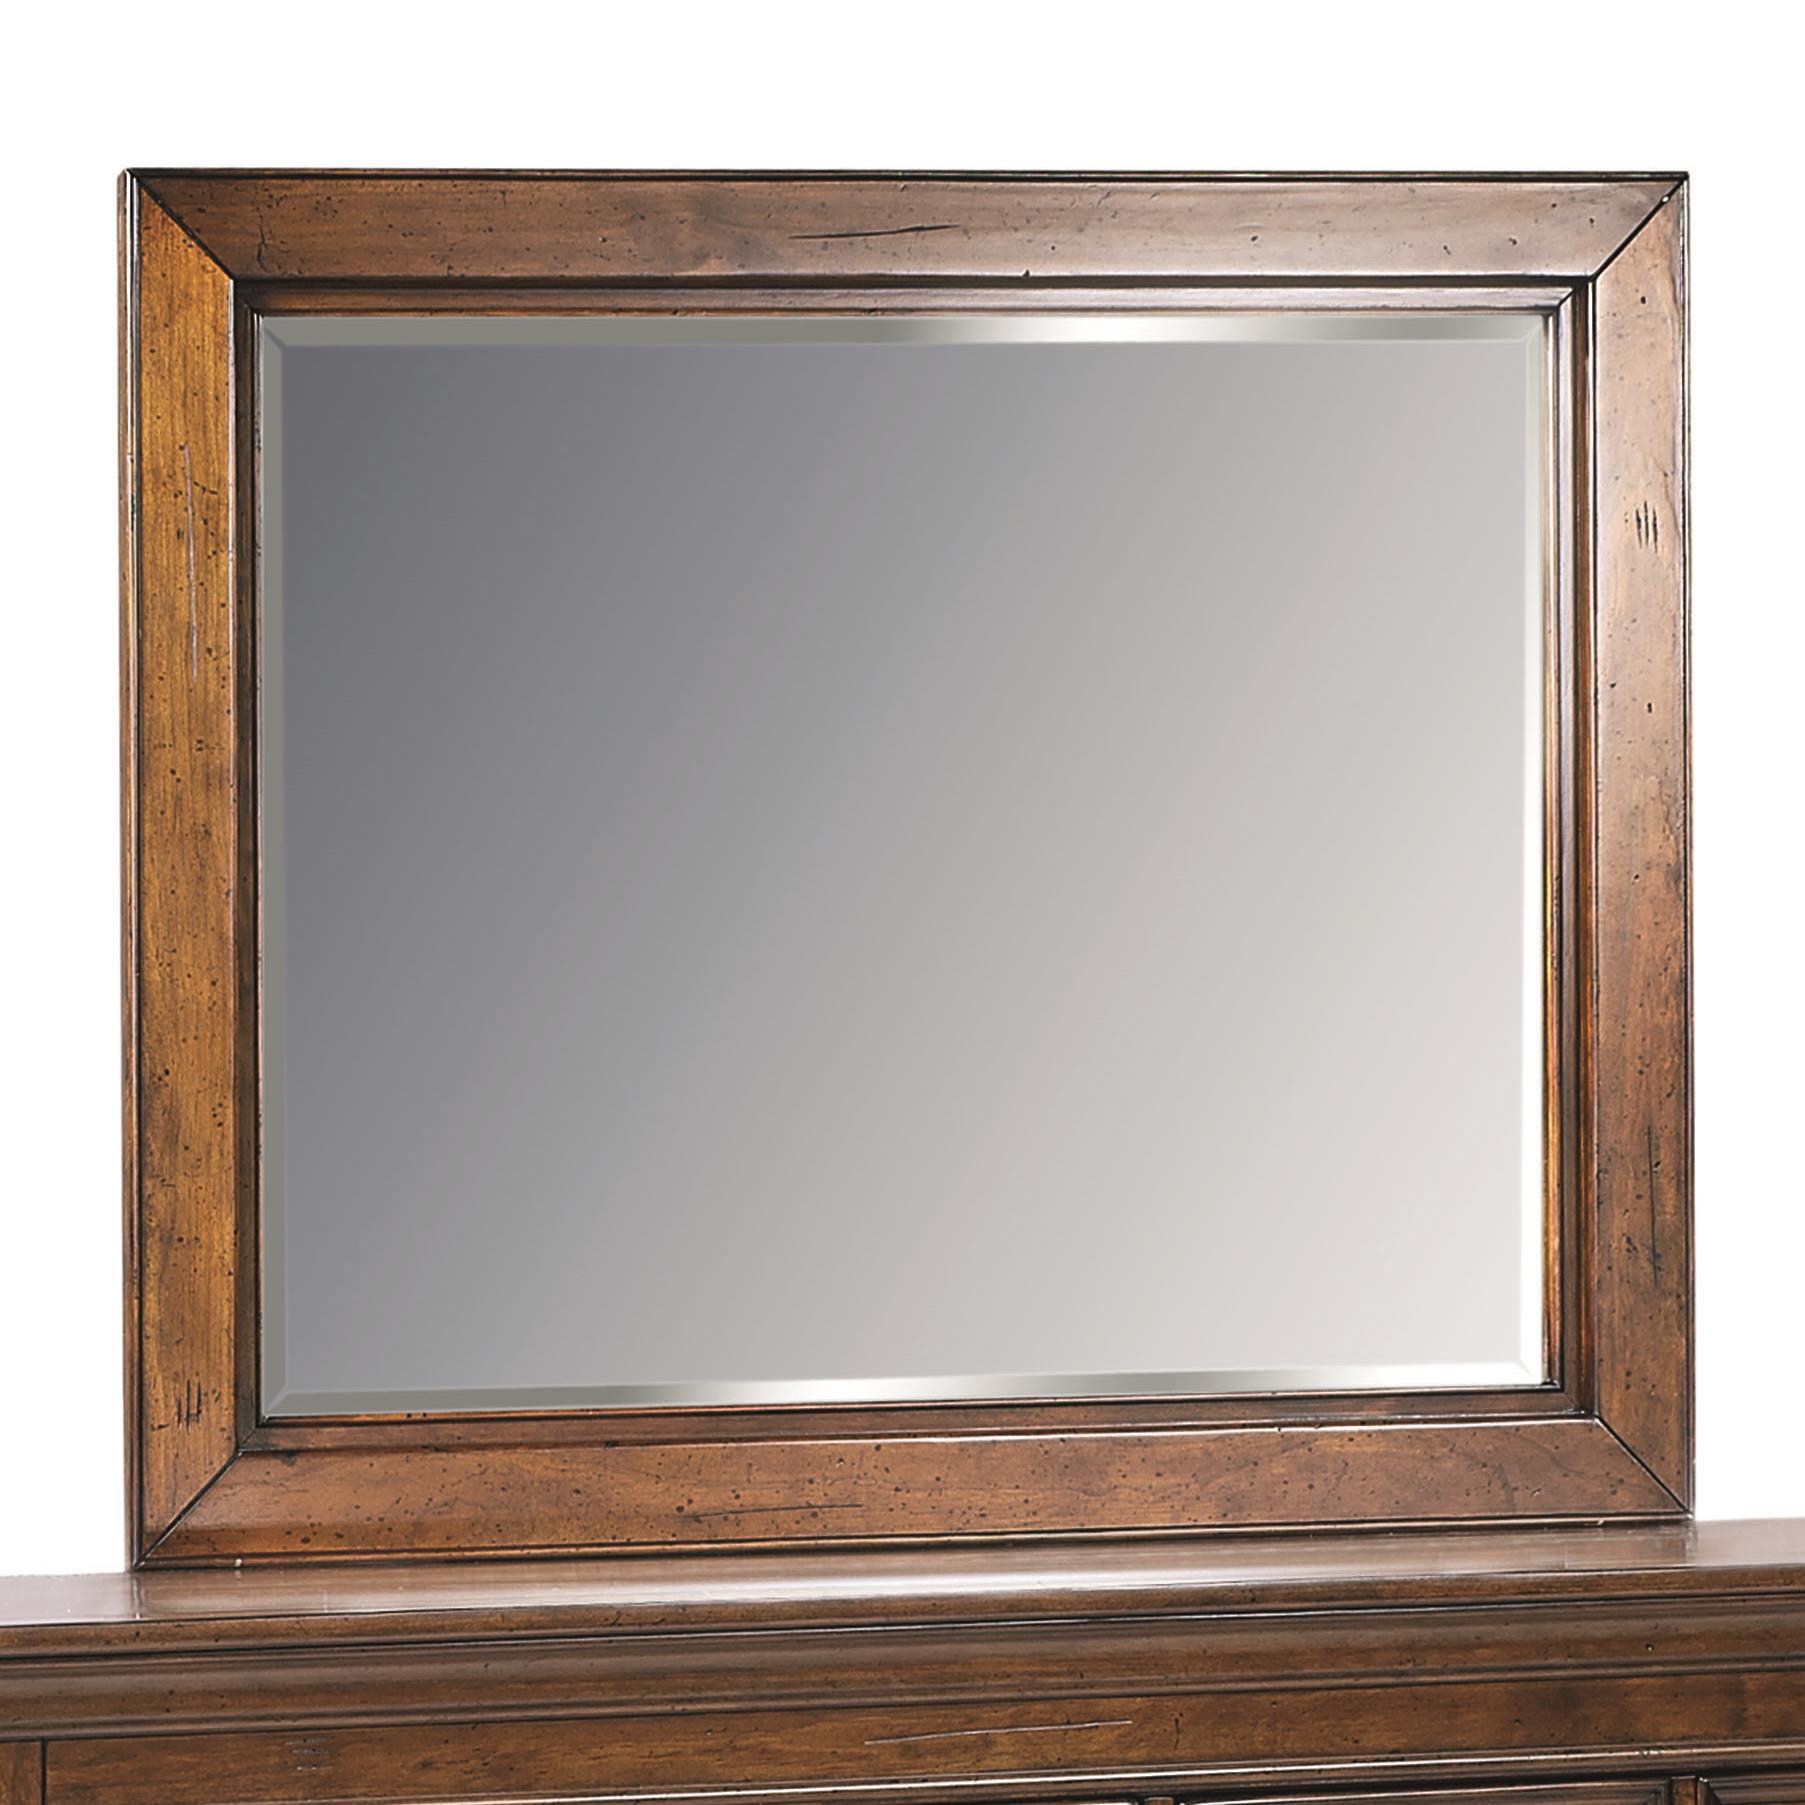 Aspenhome Camden Mirror  - Item Number: I57-464